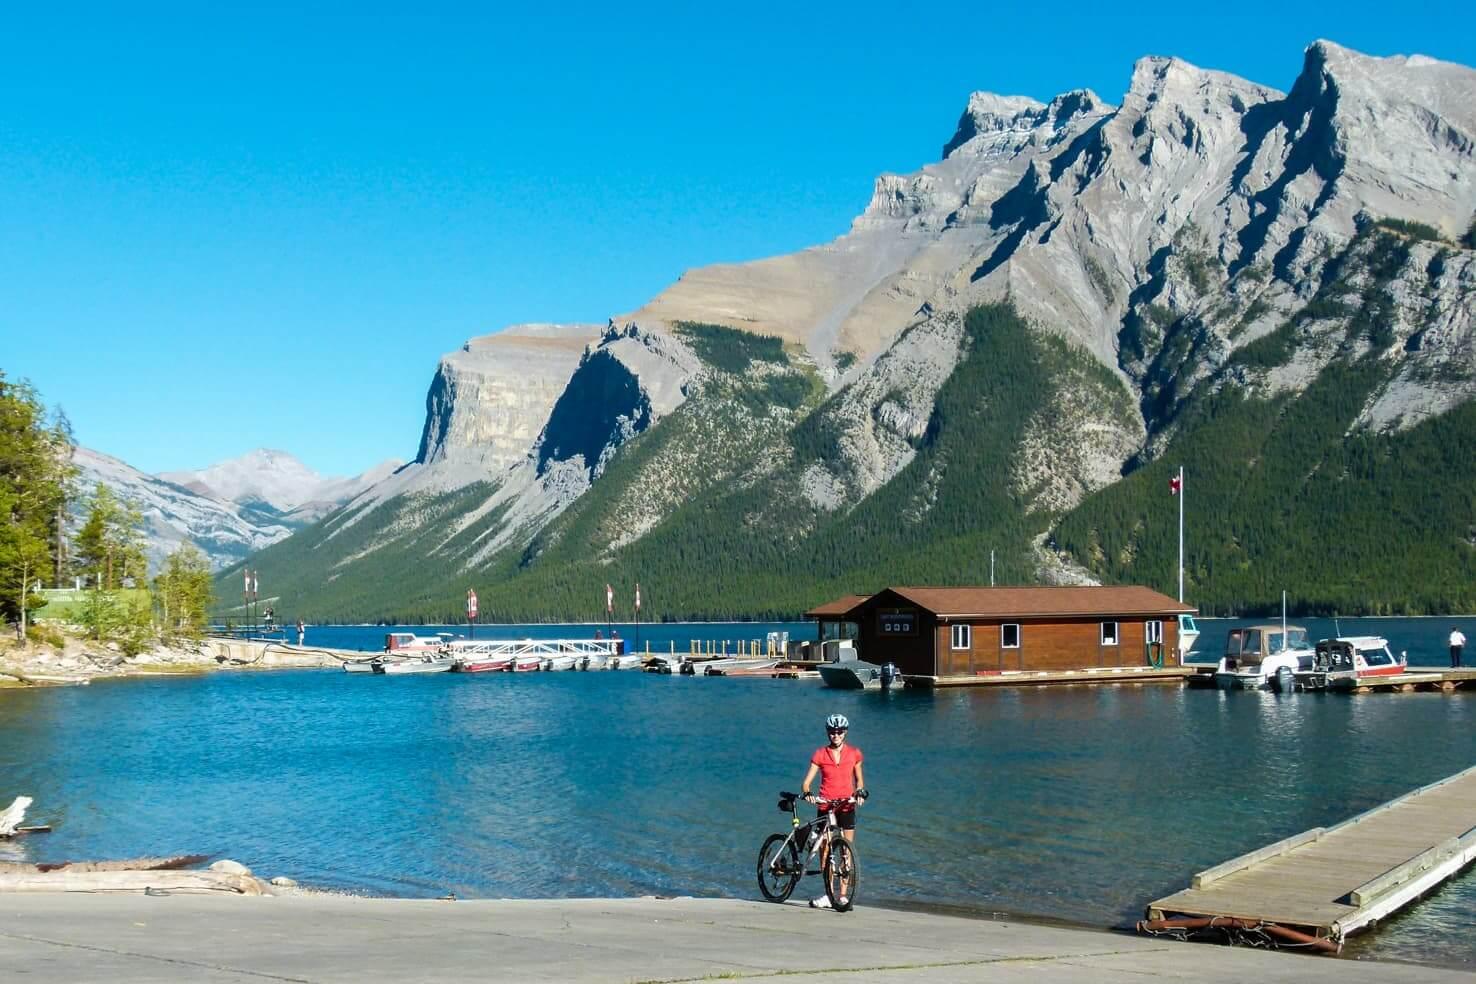 Banff hikes - 20 best hikes in Banff National Park, Canada - Banff